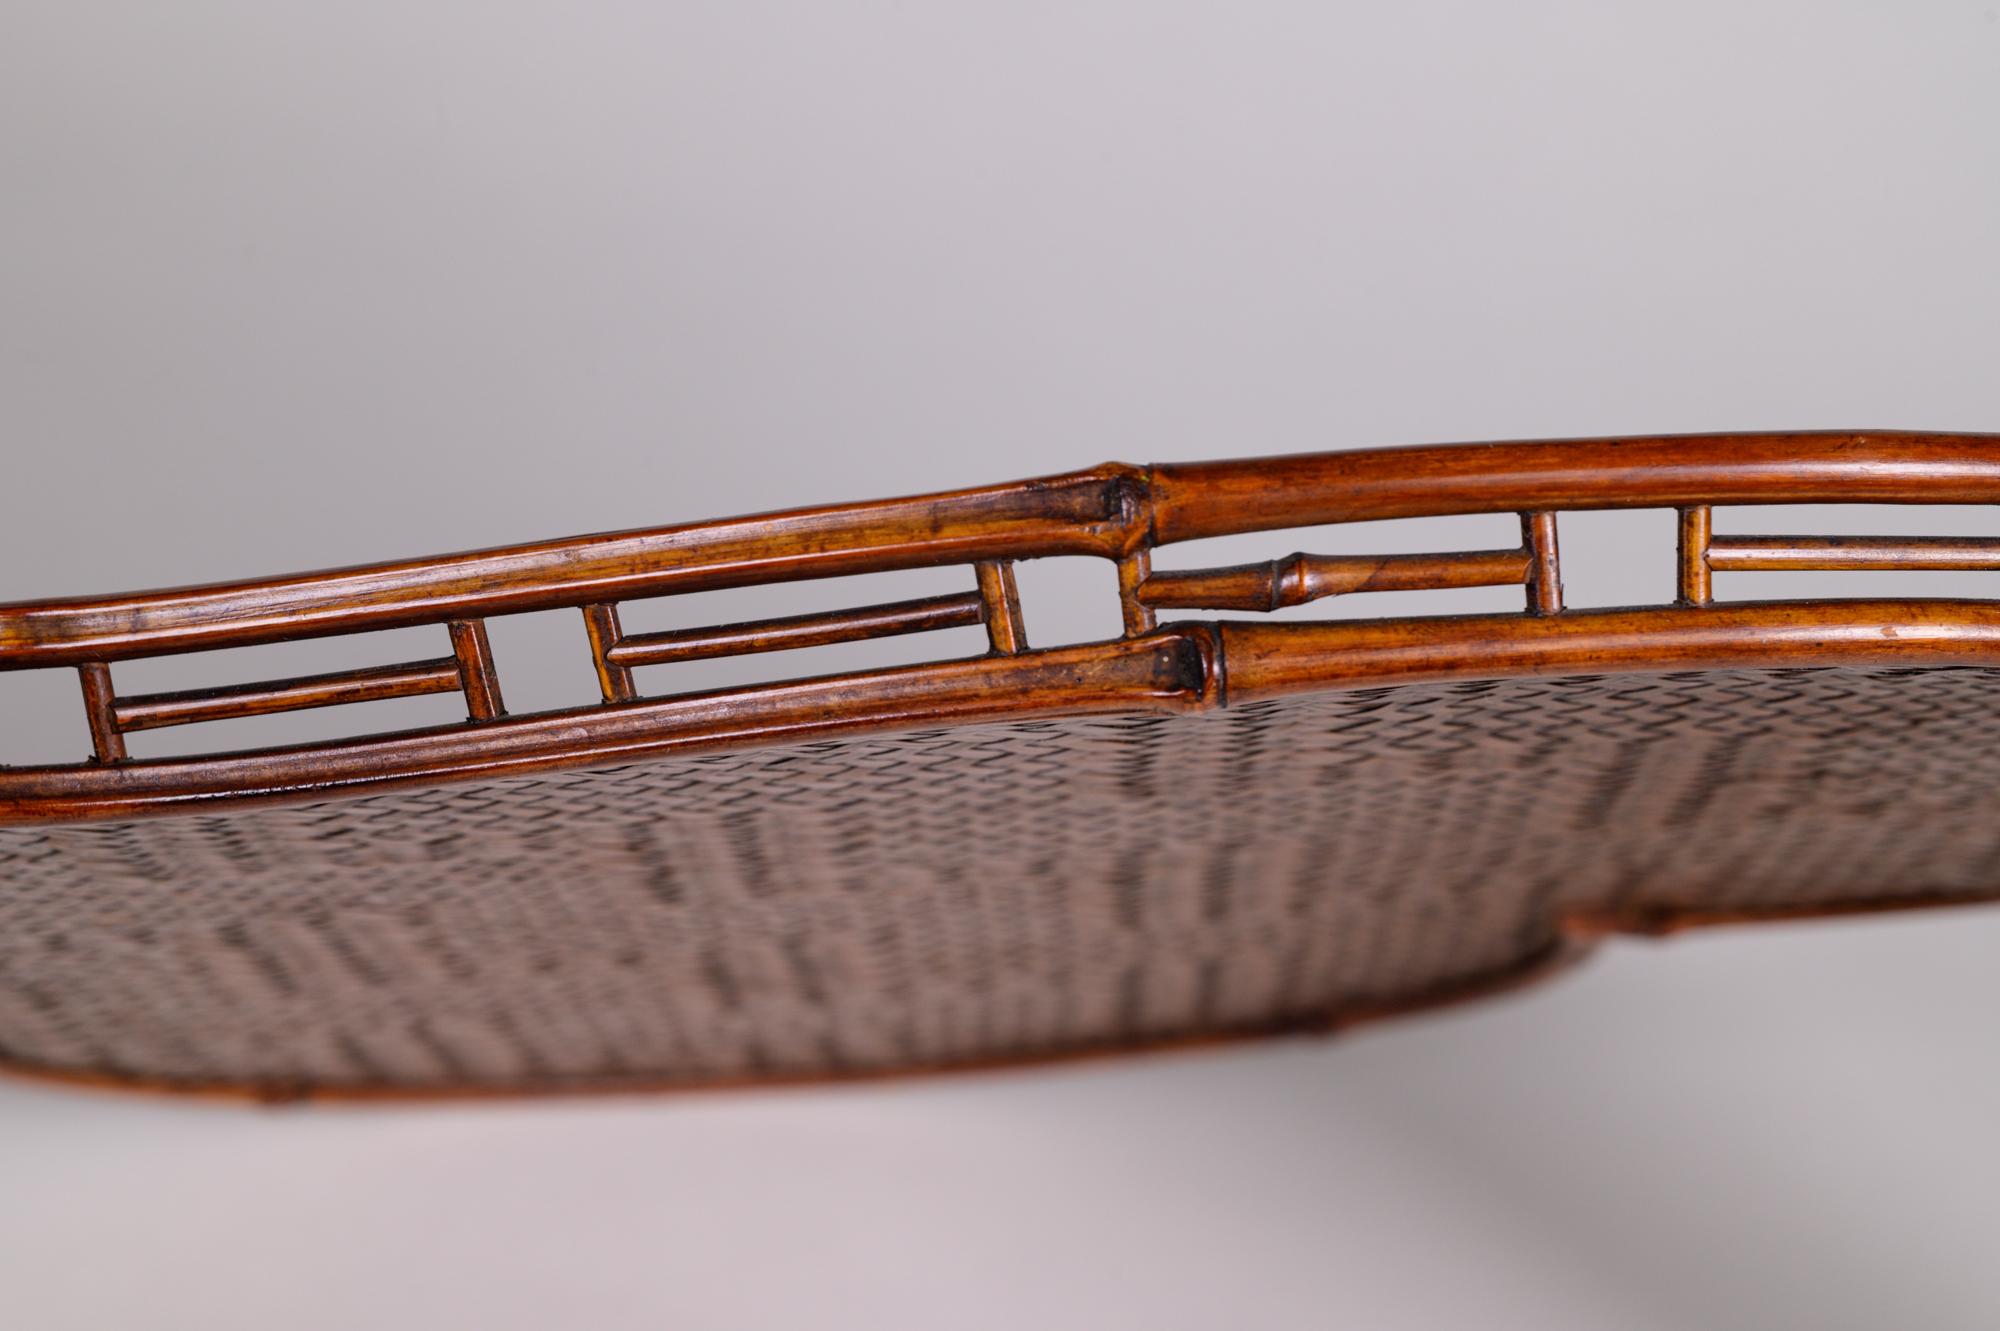 Japanese antique, Antique Tray, Japanese tray, Japanese rattan, rattan, heart, heart tray, rattan tray, antique tray